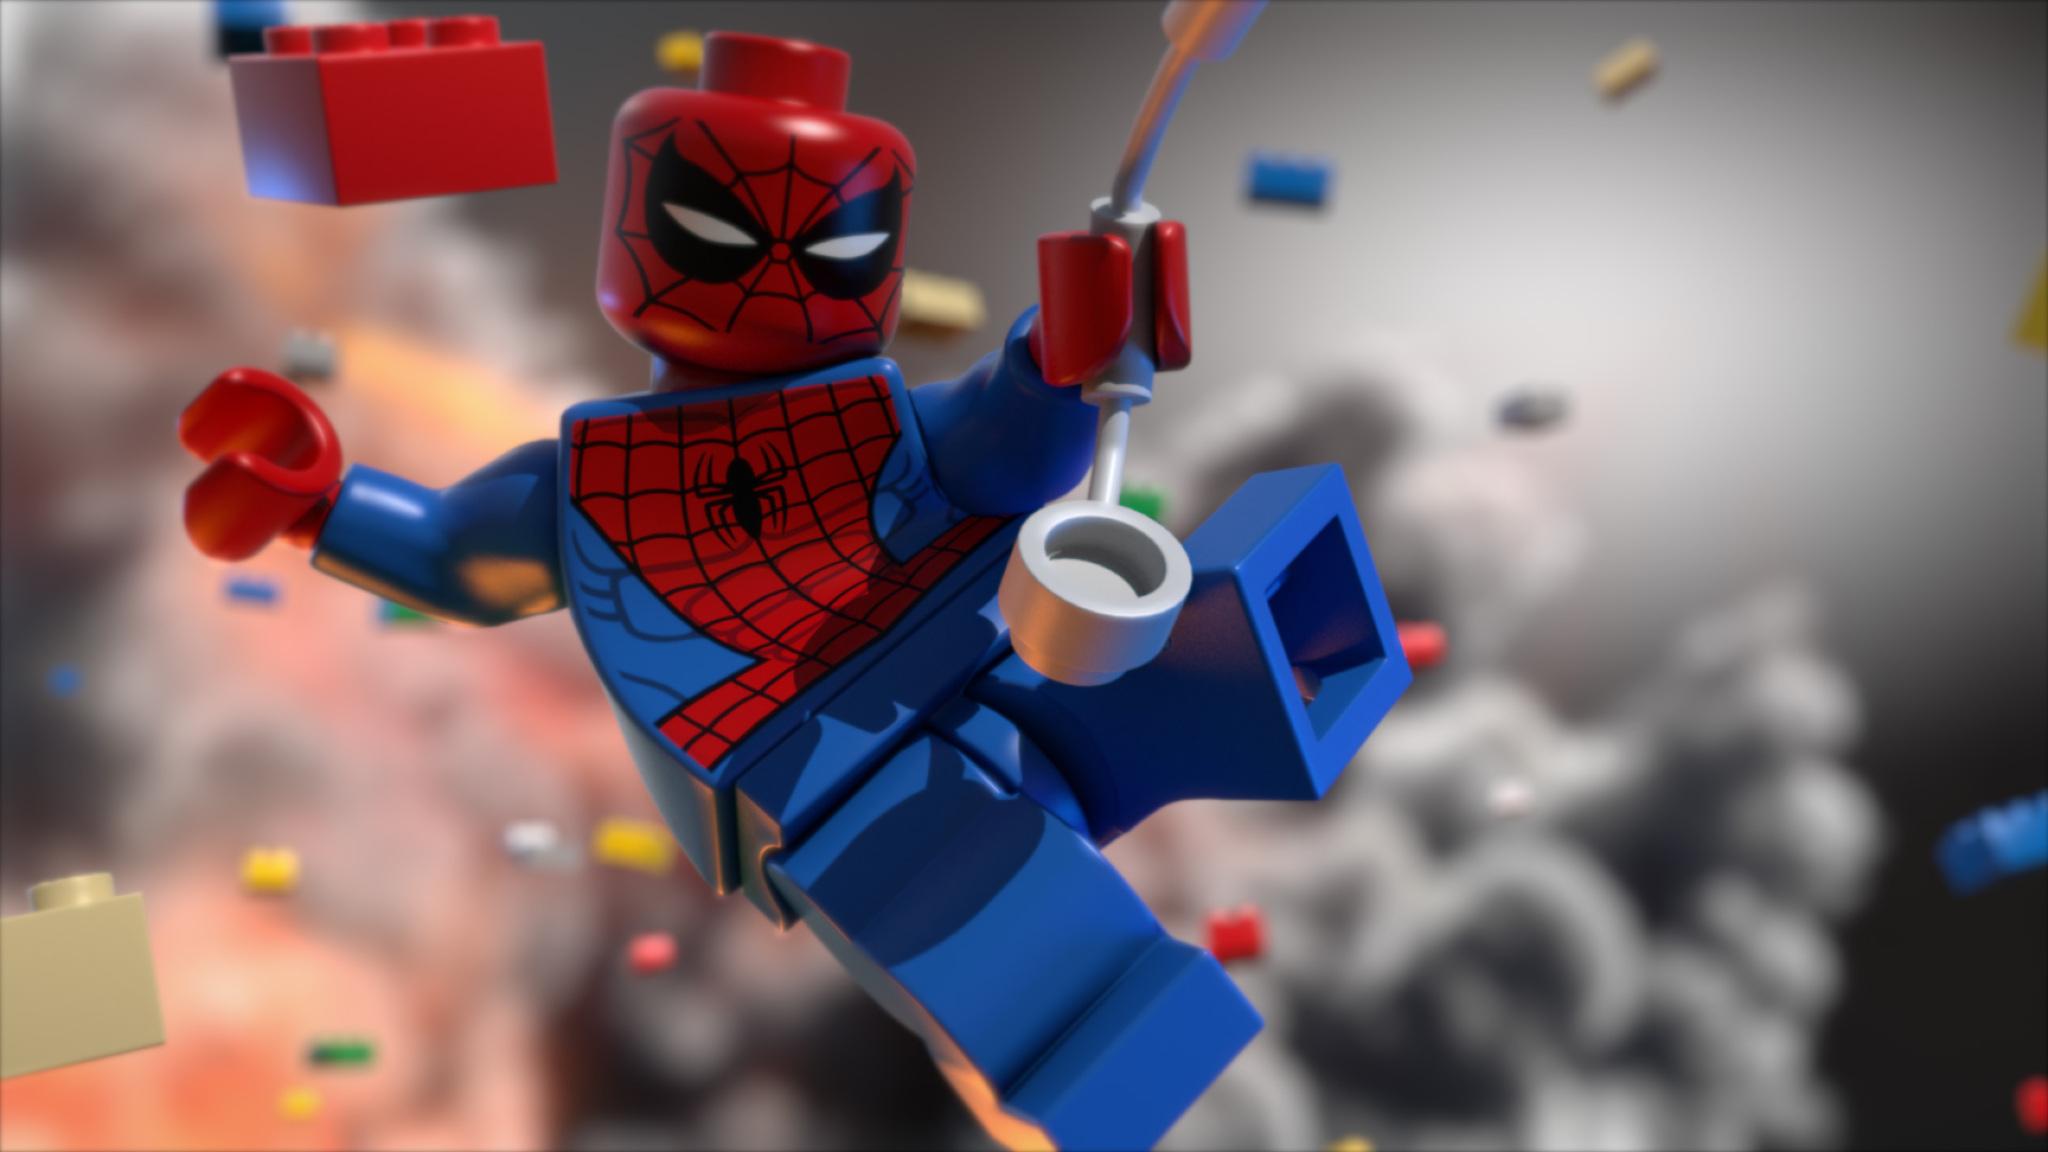 2048x1152 lego spiderman 2048x1152 resolution hd 4k wallpapers lego spidermang voltagebd Choice Image